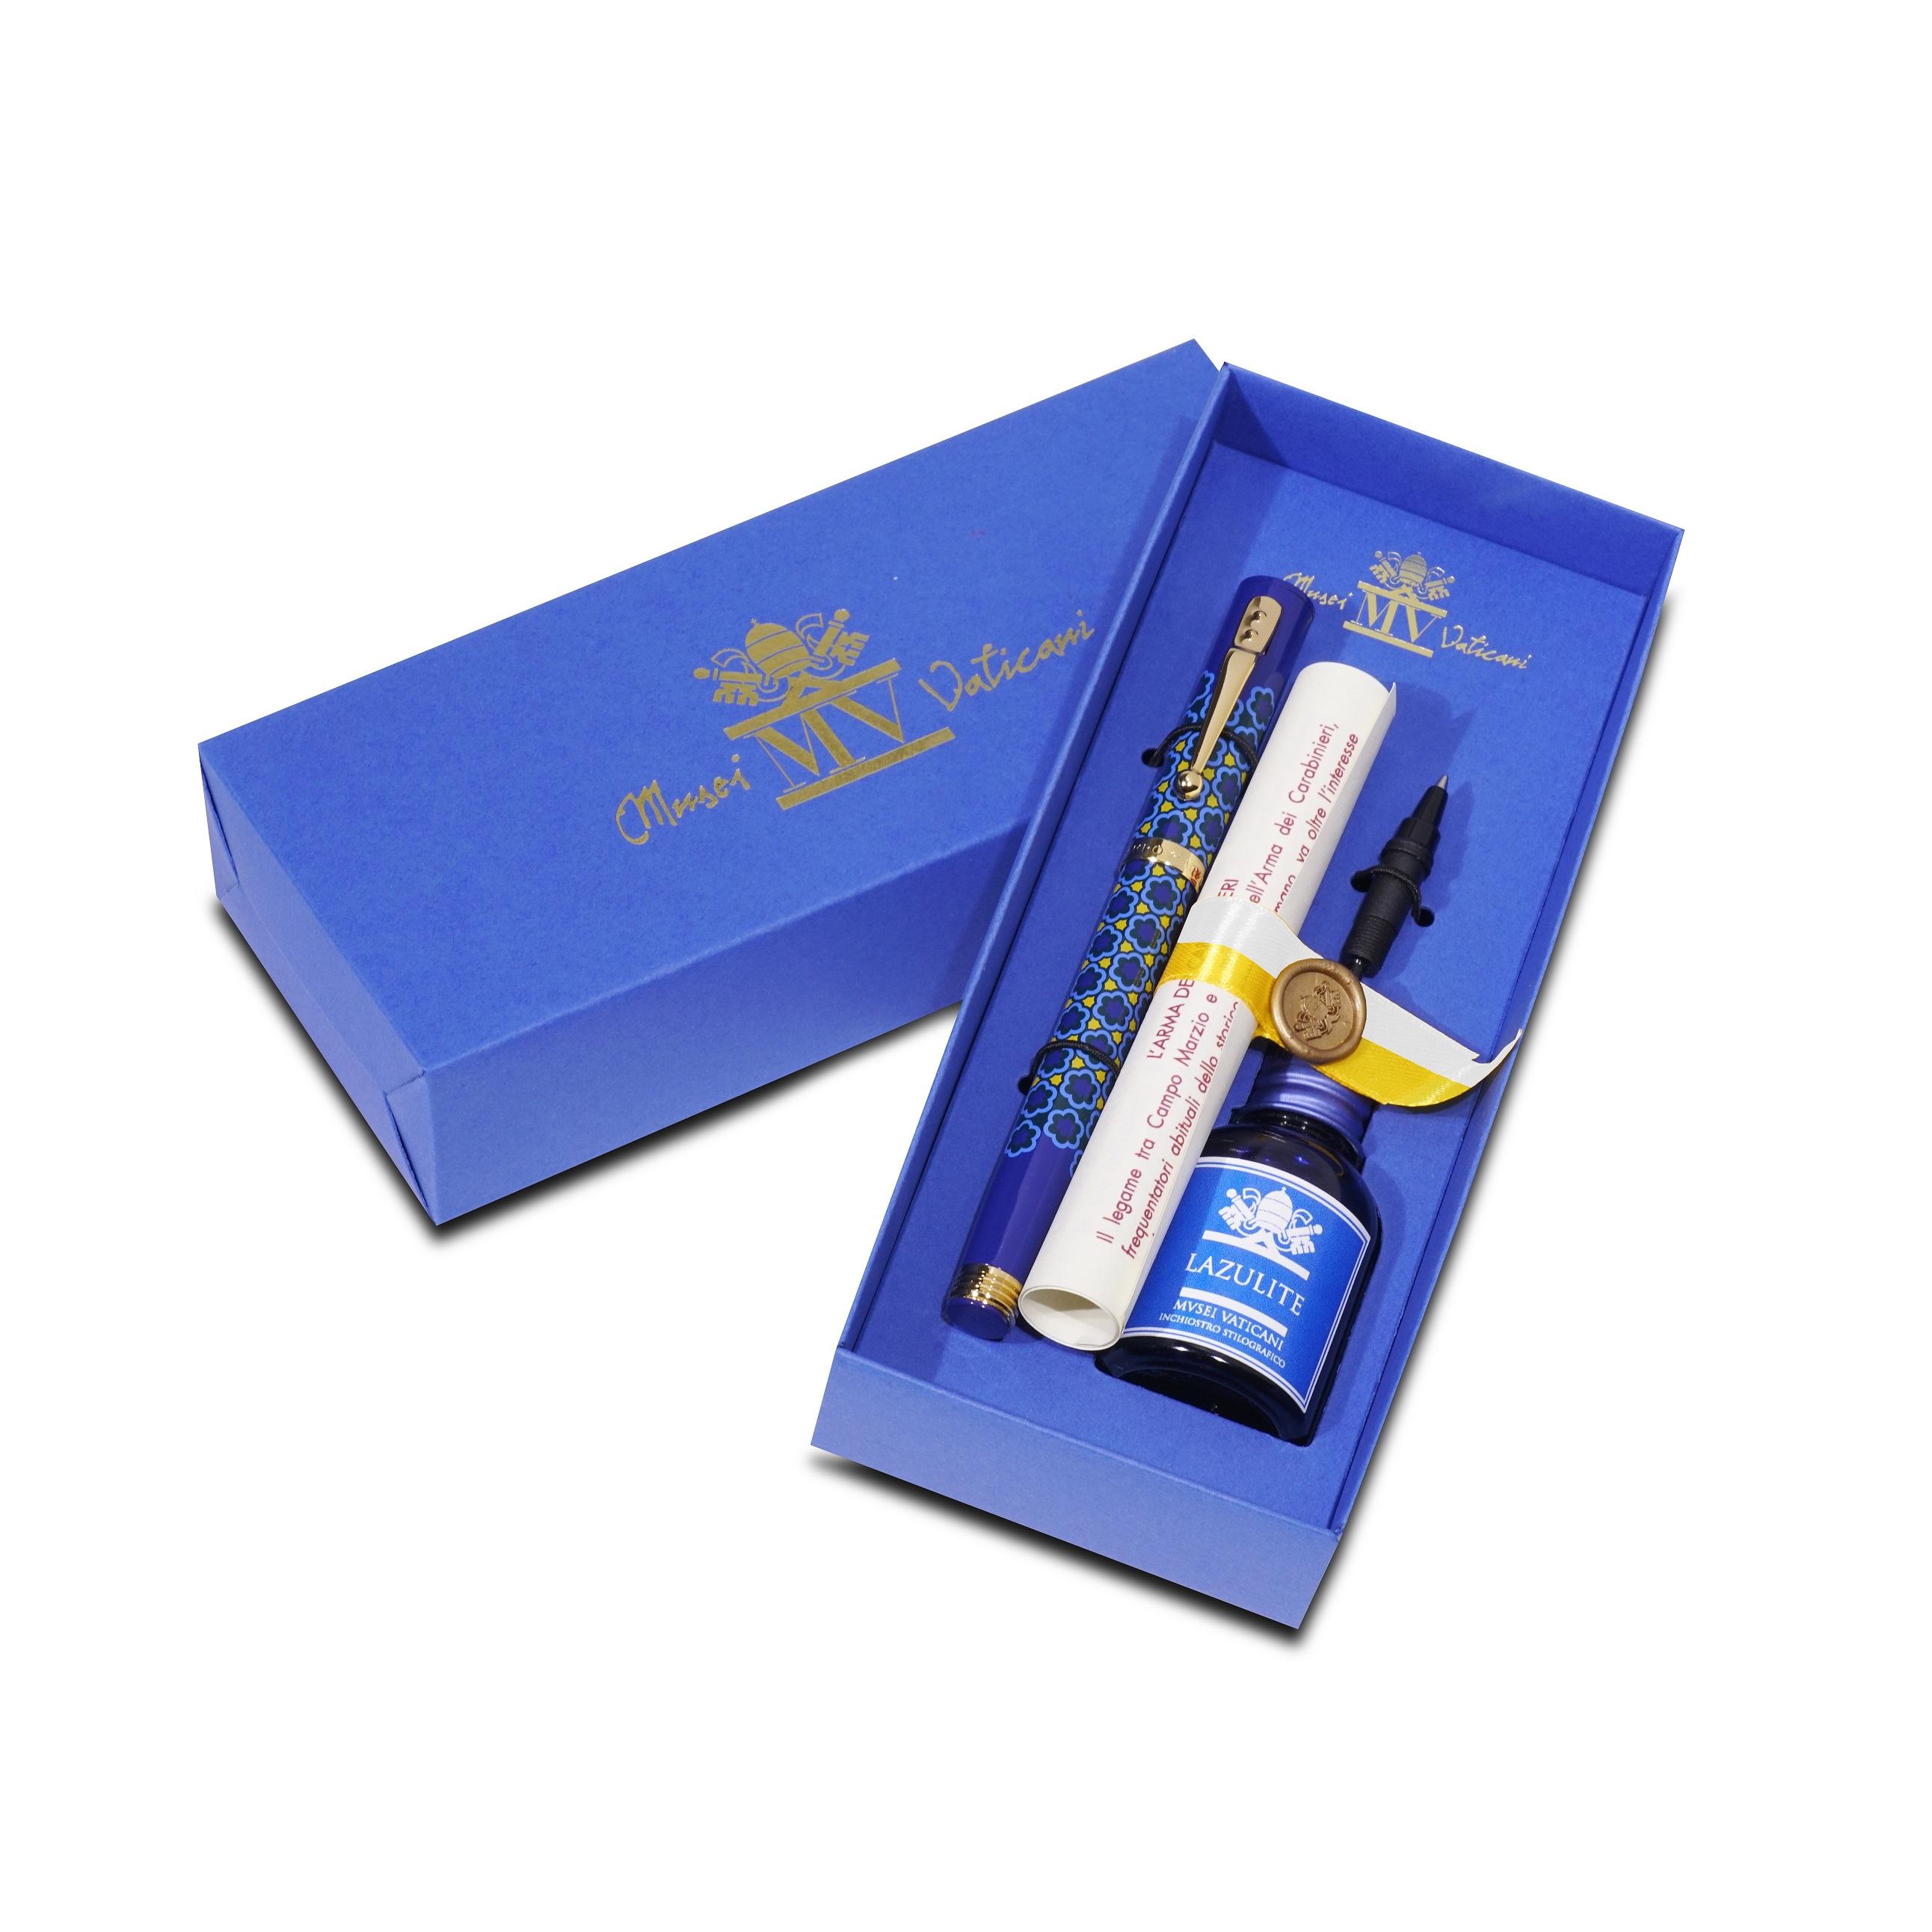 Penna Stilografica Dulcis Colorum – Lazulite